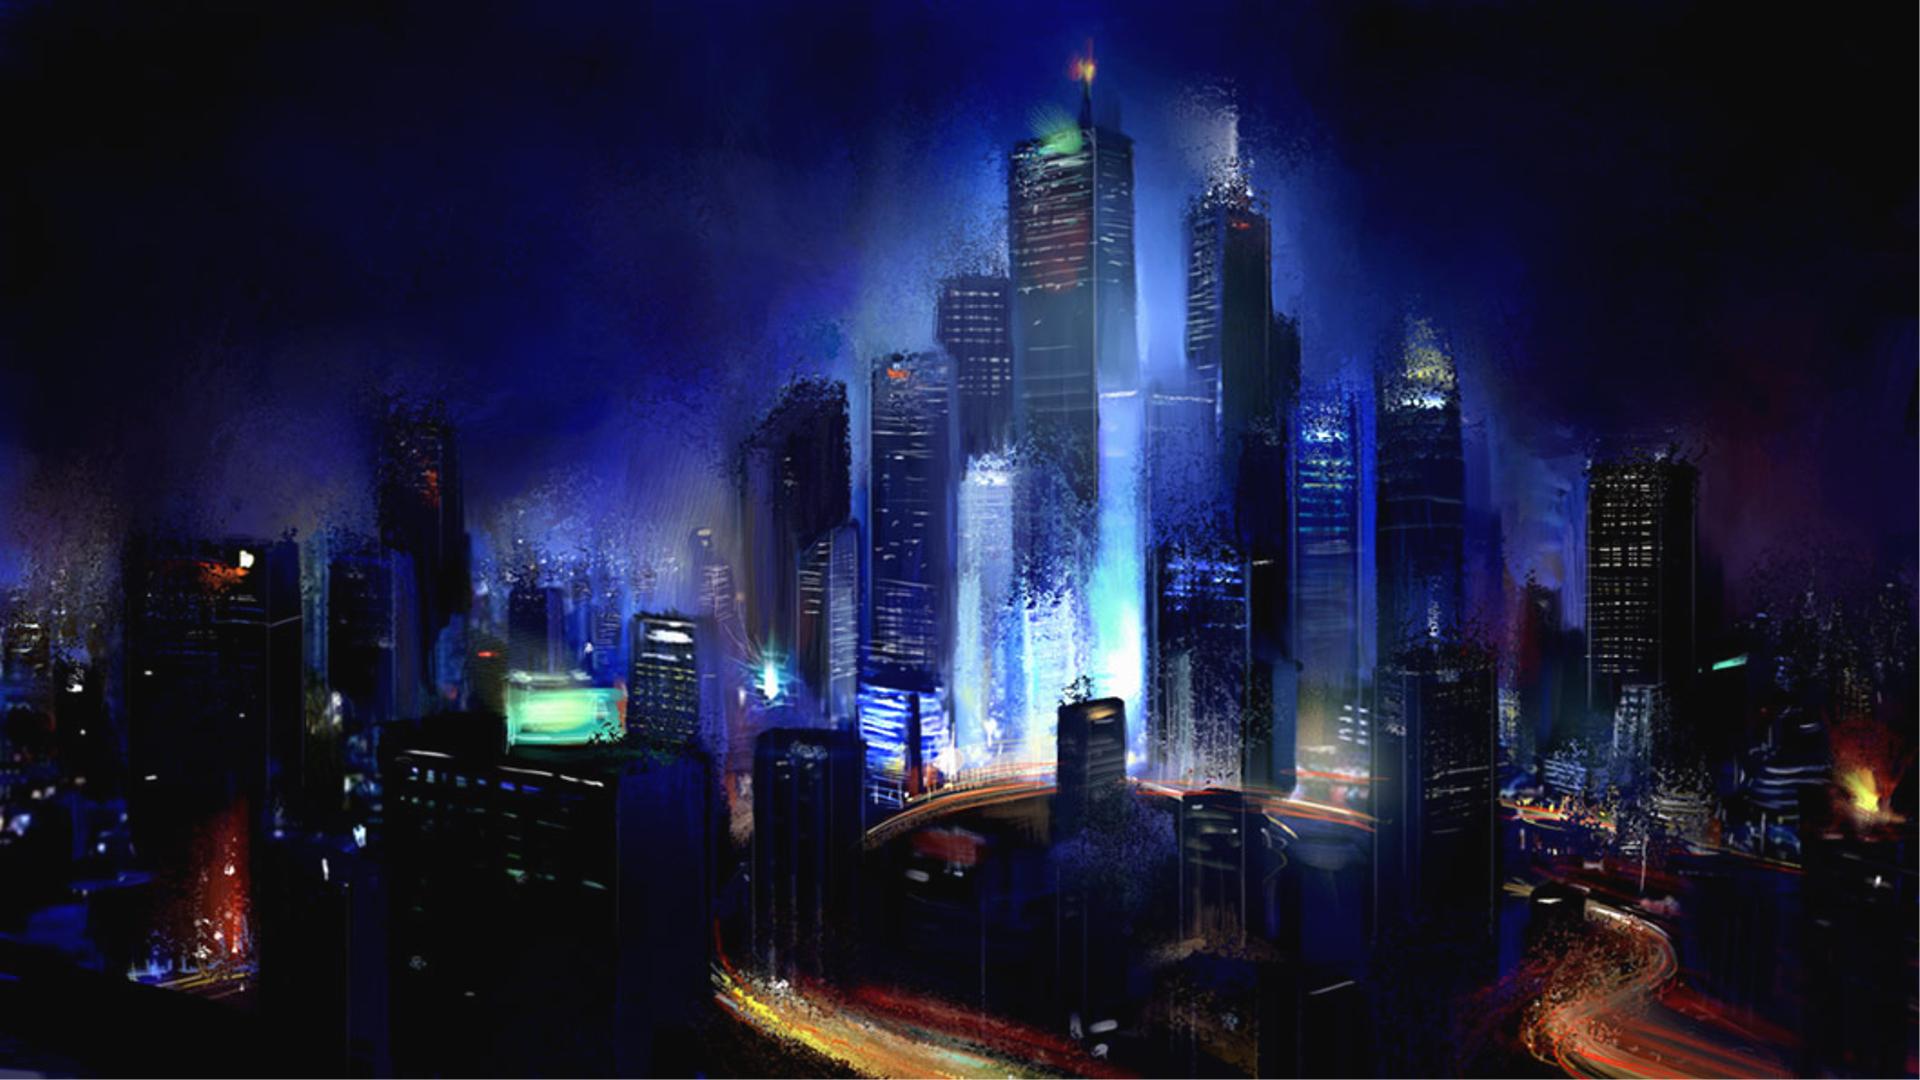 Download Cityscape Hd Wallpaper 1920x1080 | Wallpoper #322356